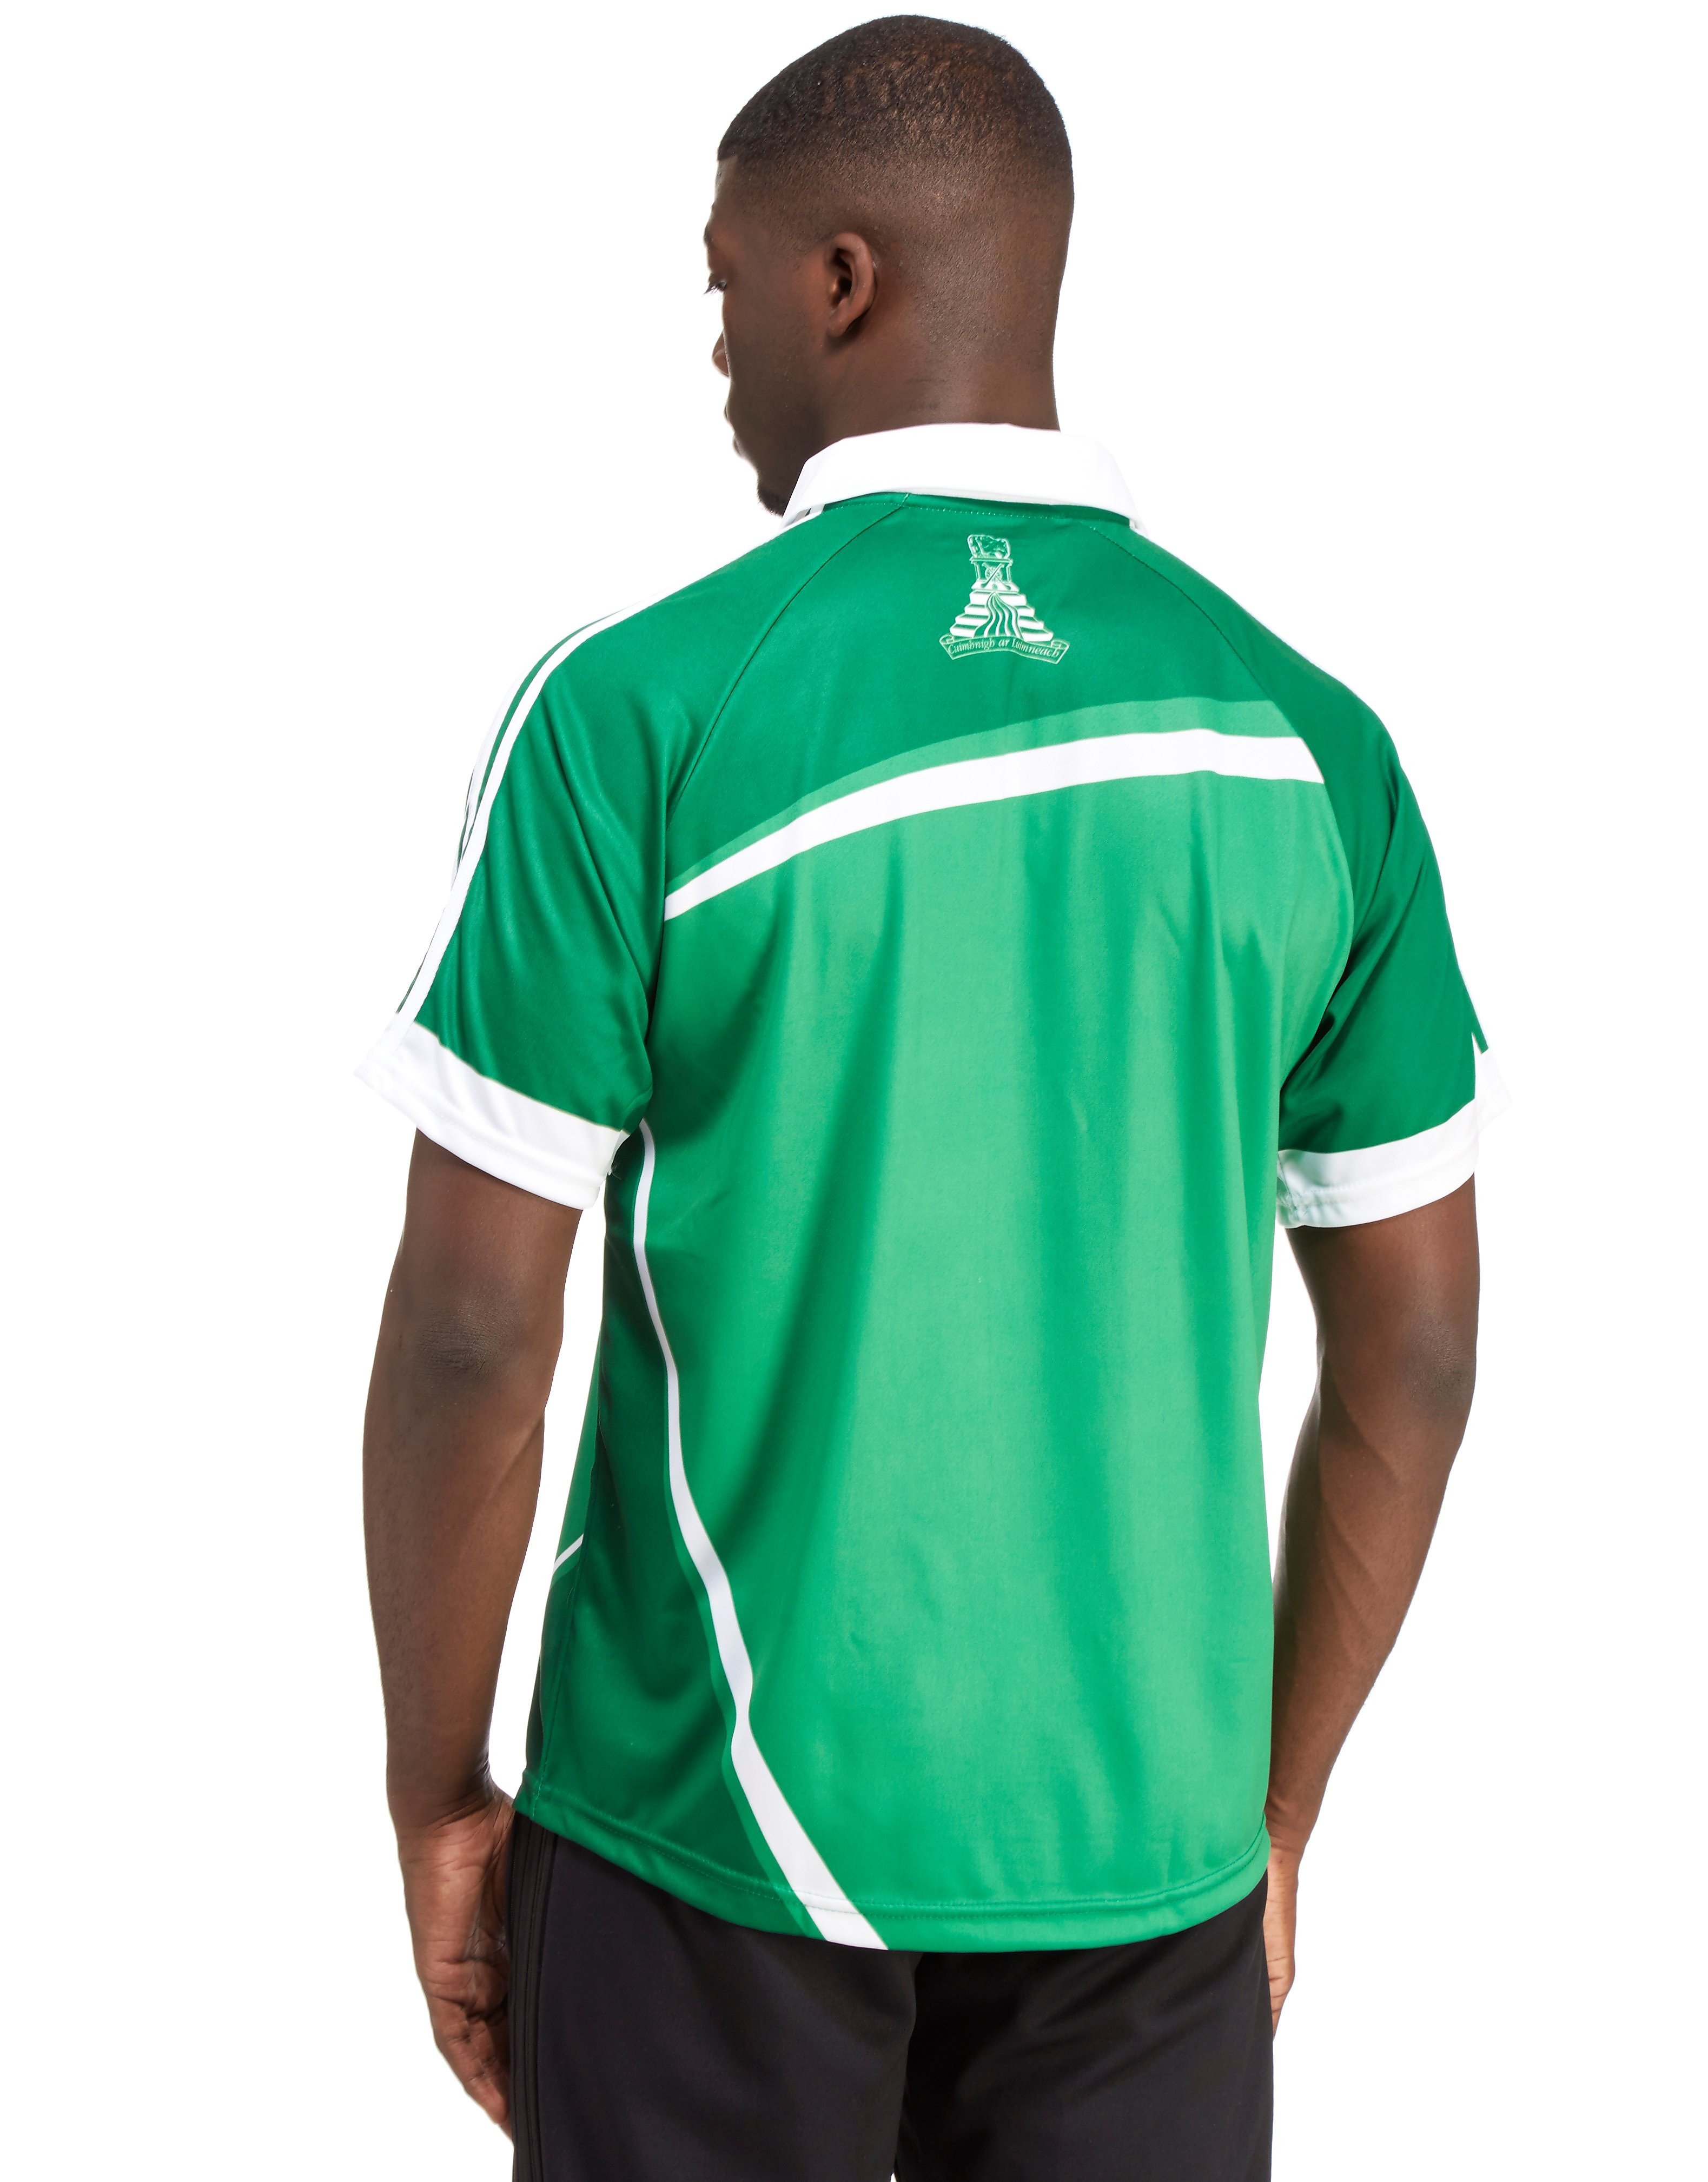 O'Neills GAA Limerick Home 2014 shirt